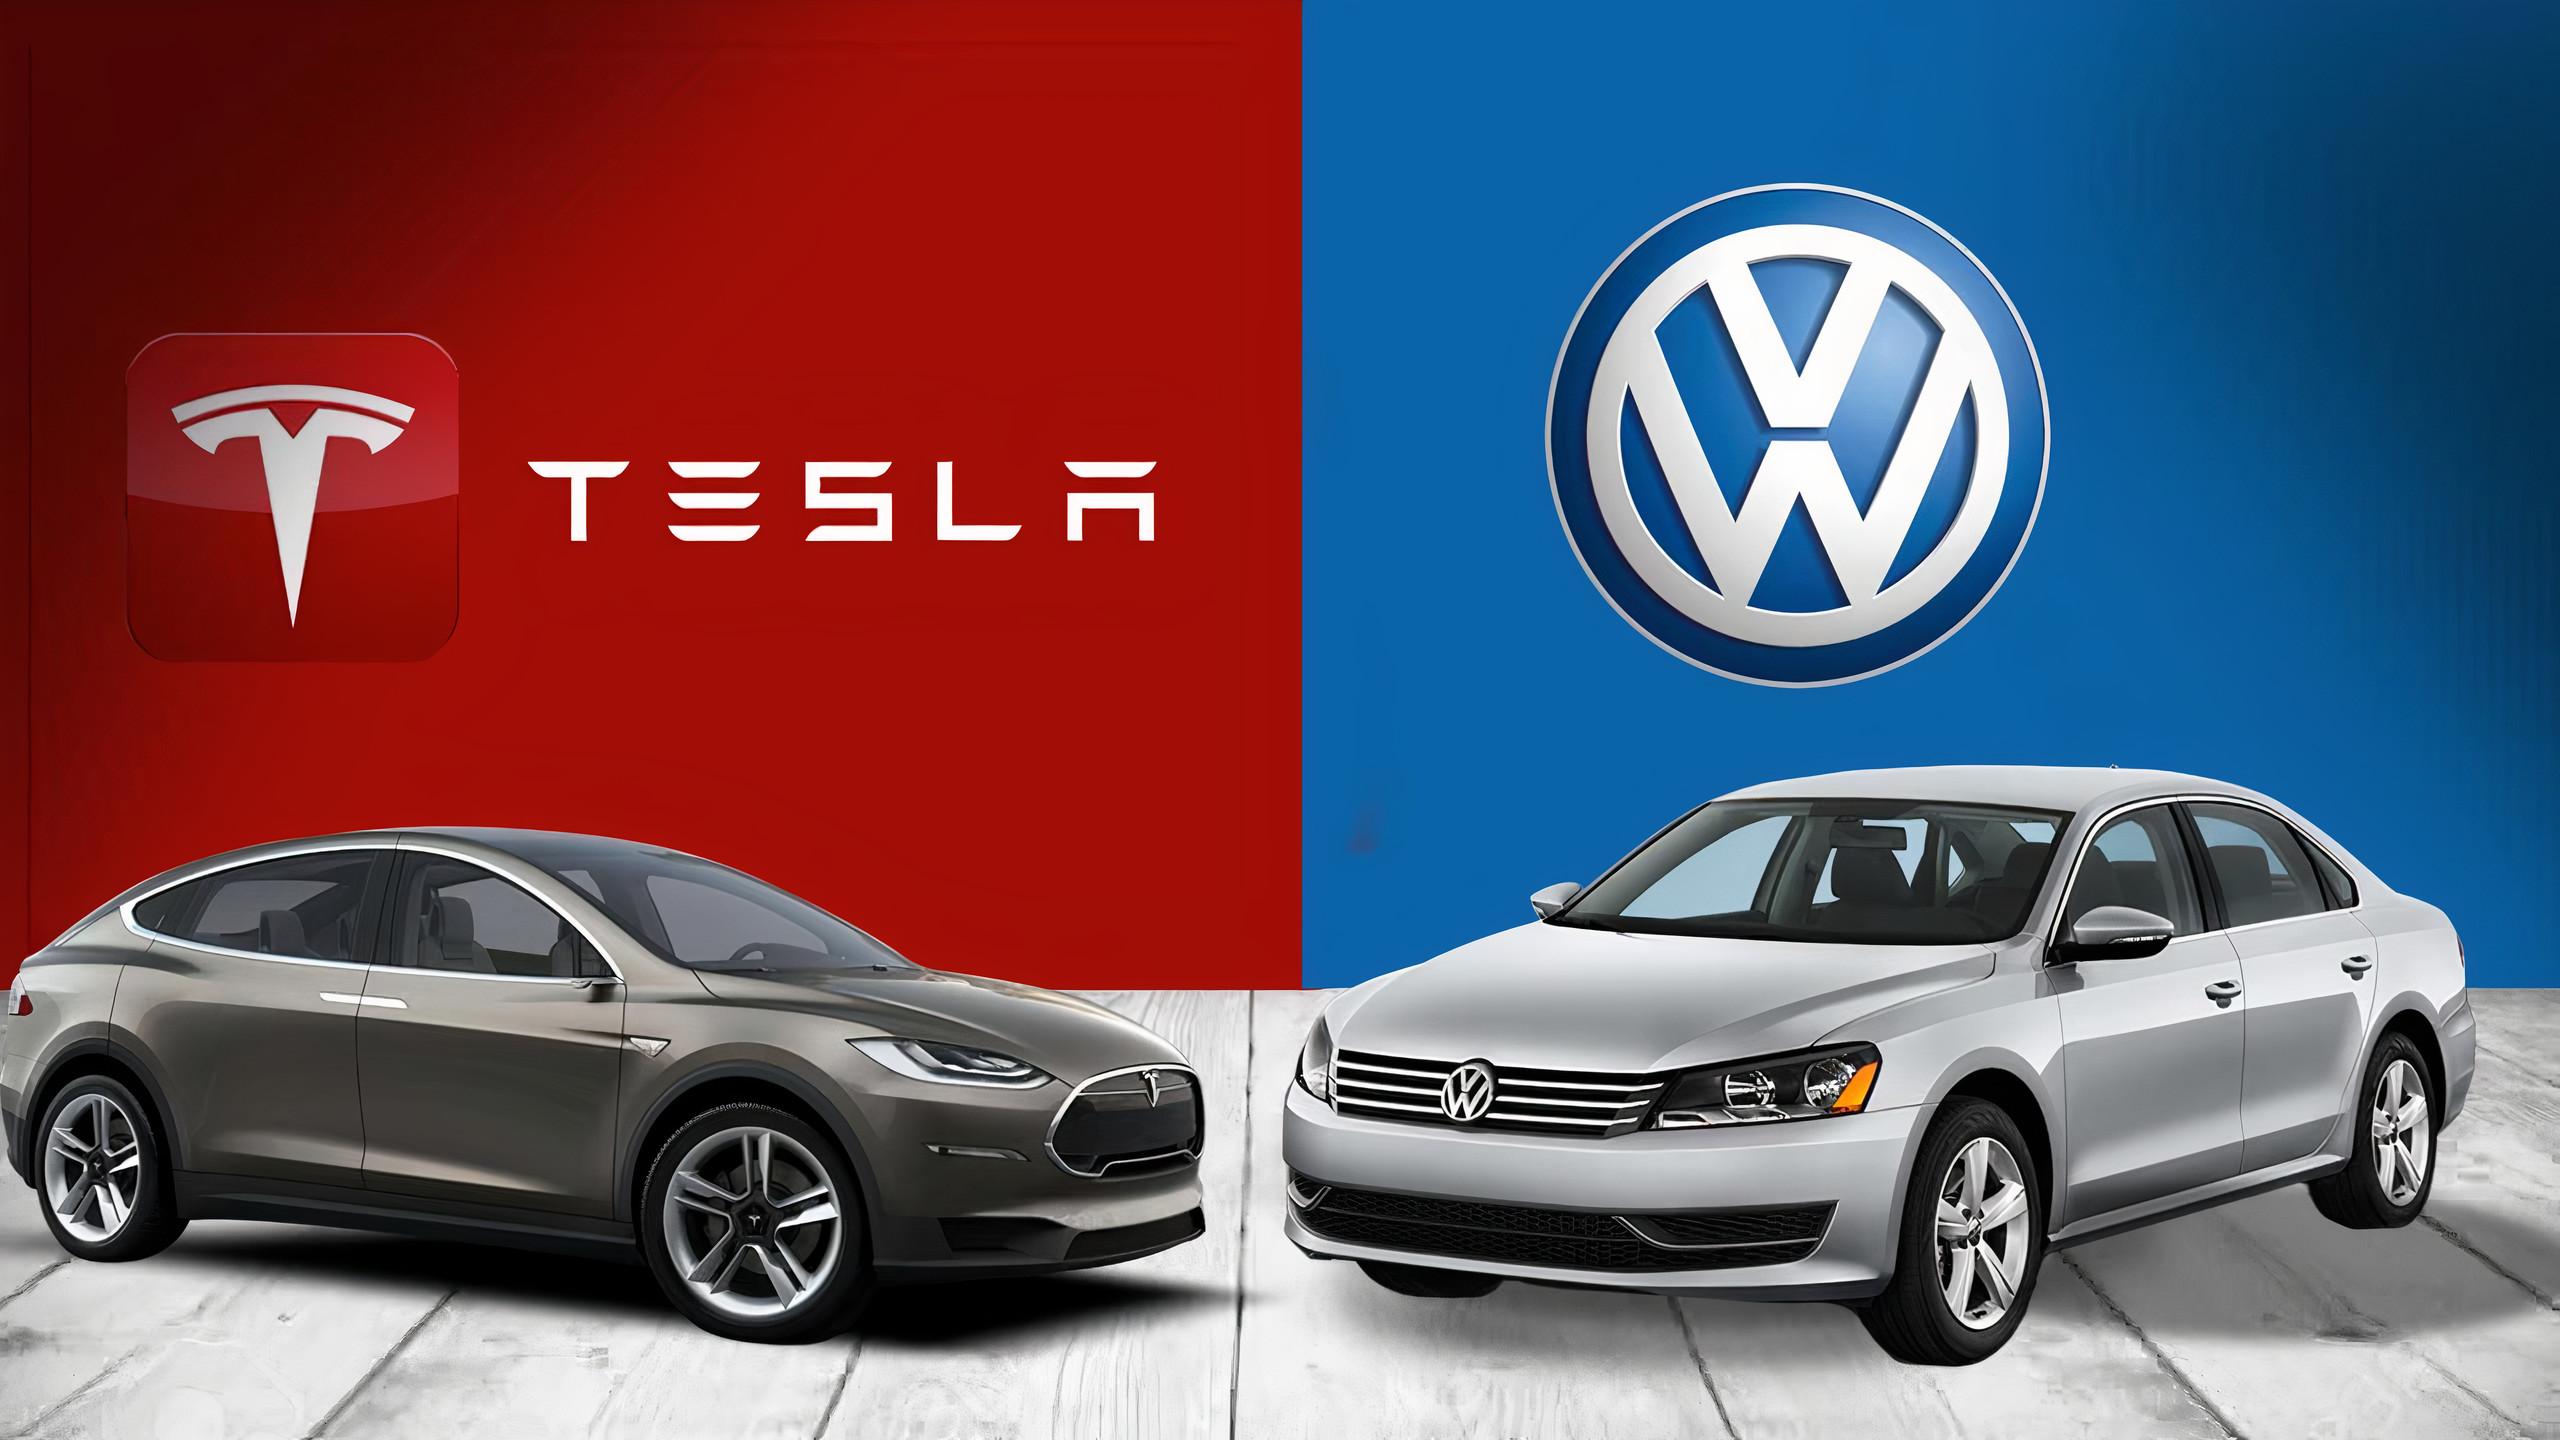 Volkswagen and Tesla car in one frame